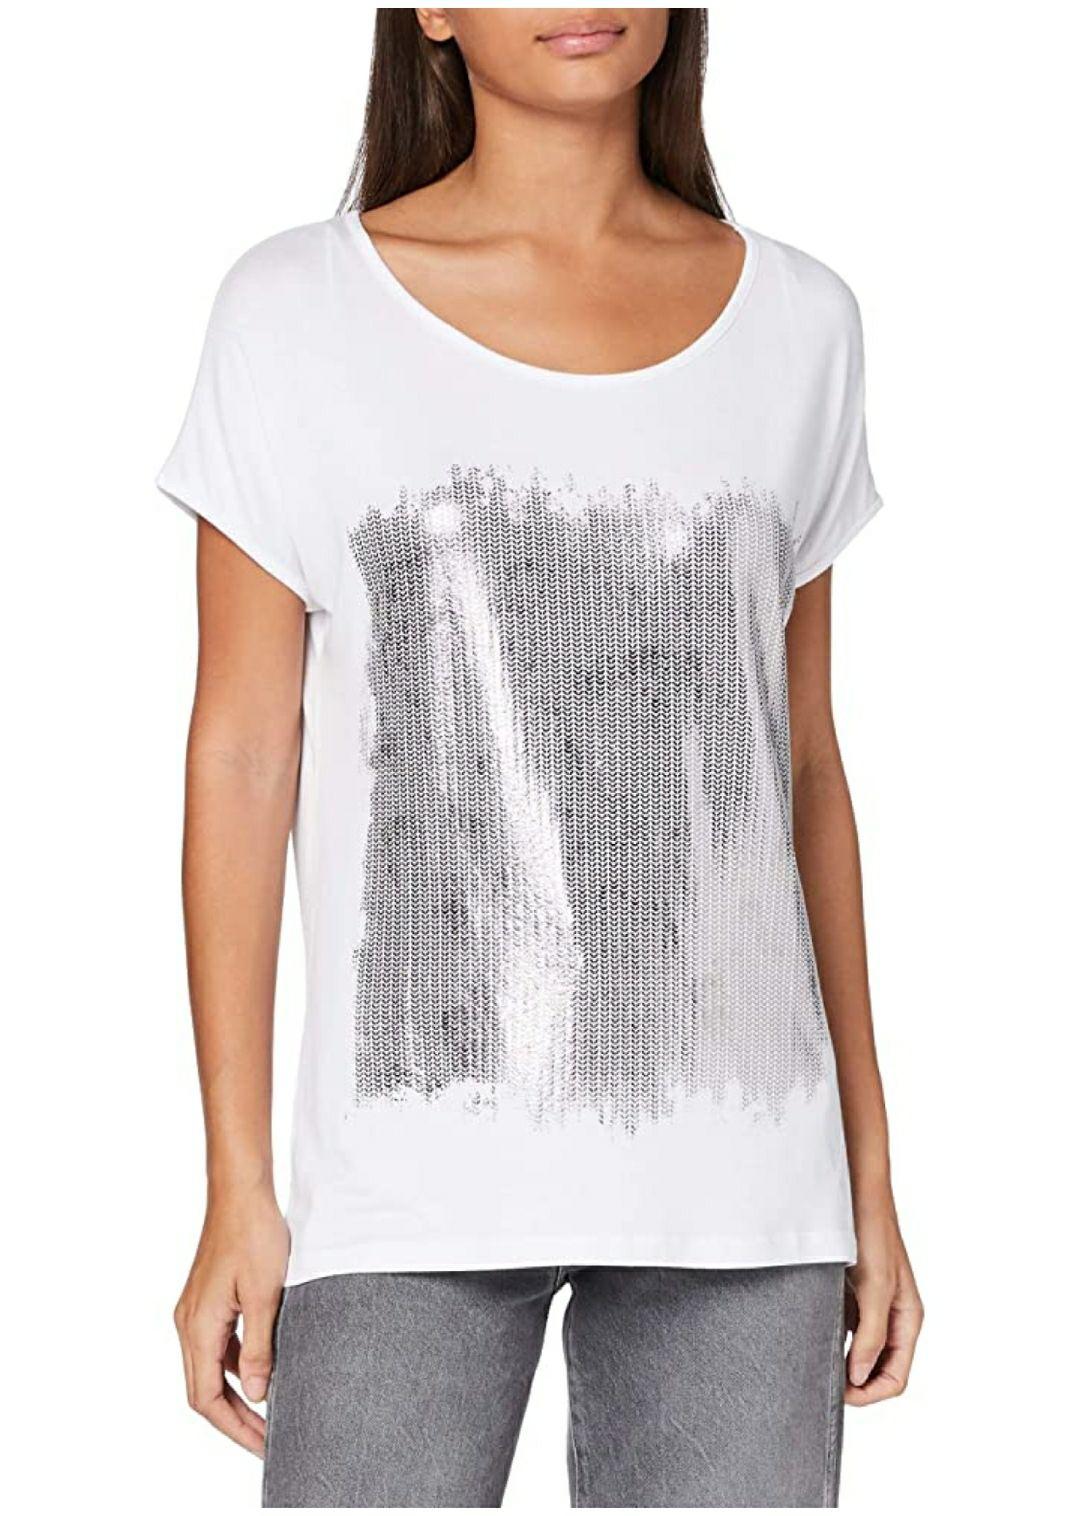 TALLA 38 - Berydale Bd299 - Camiseta Mujer